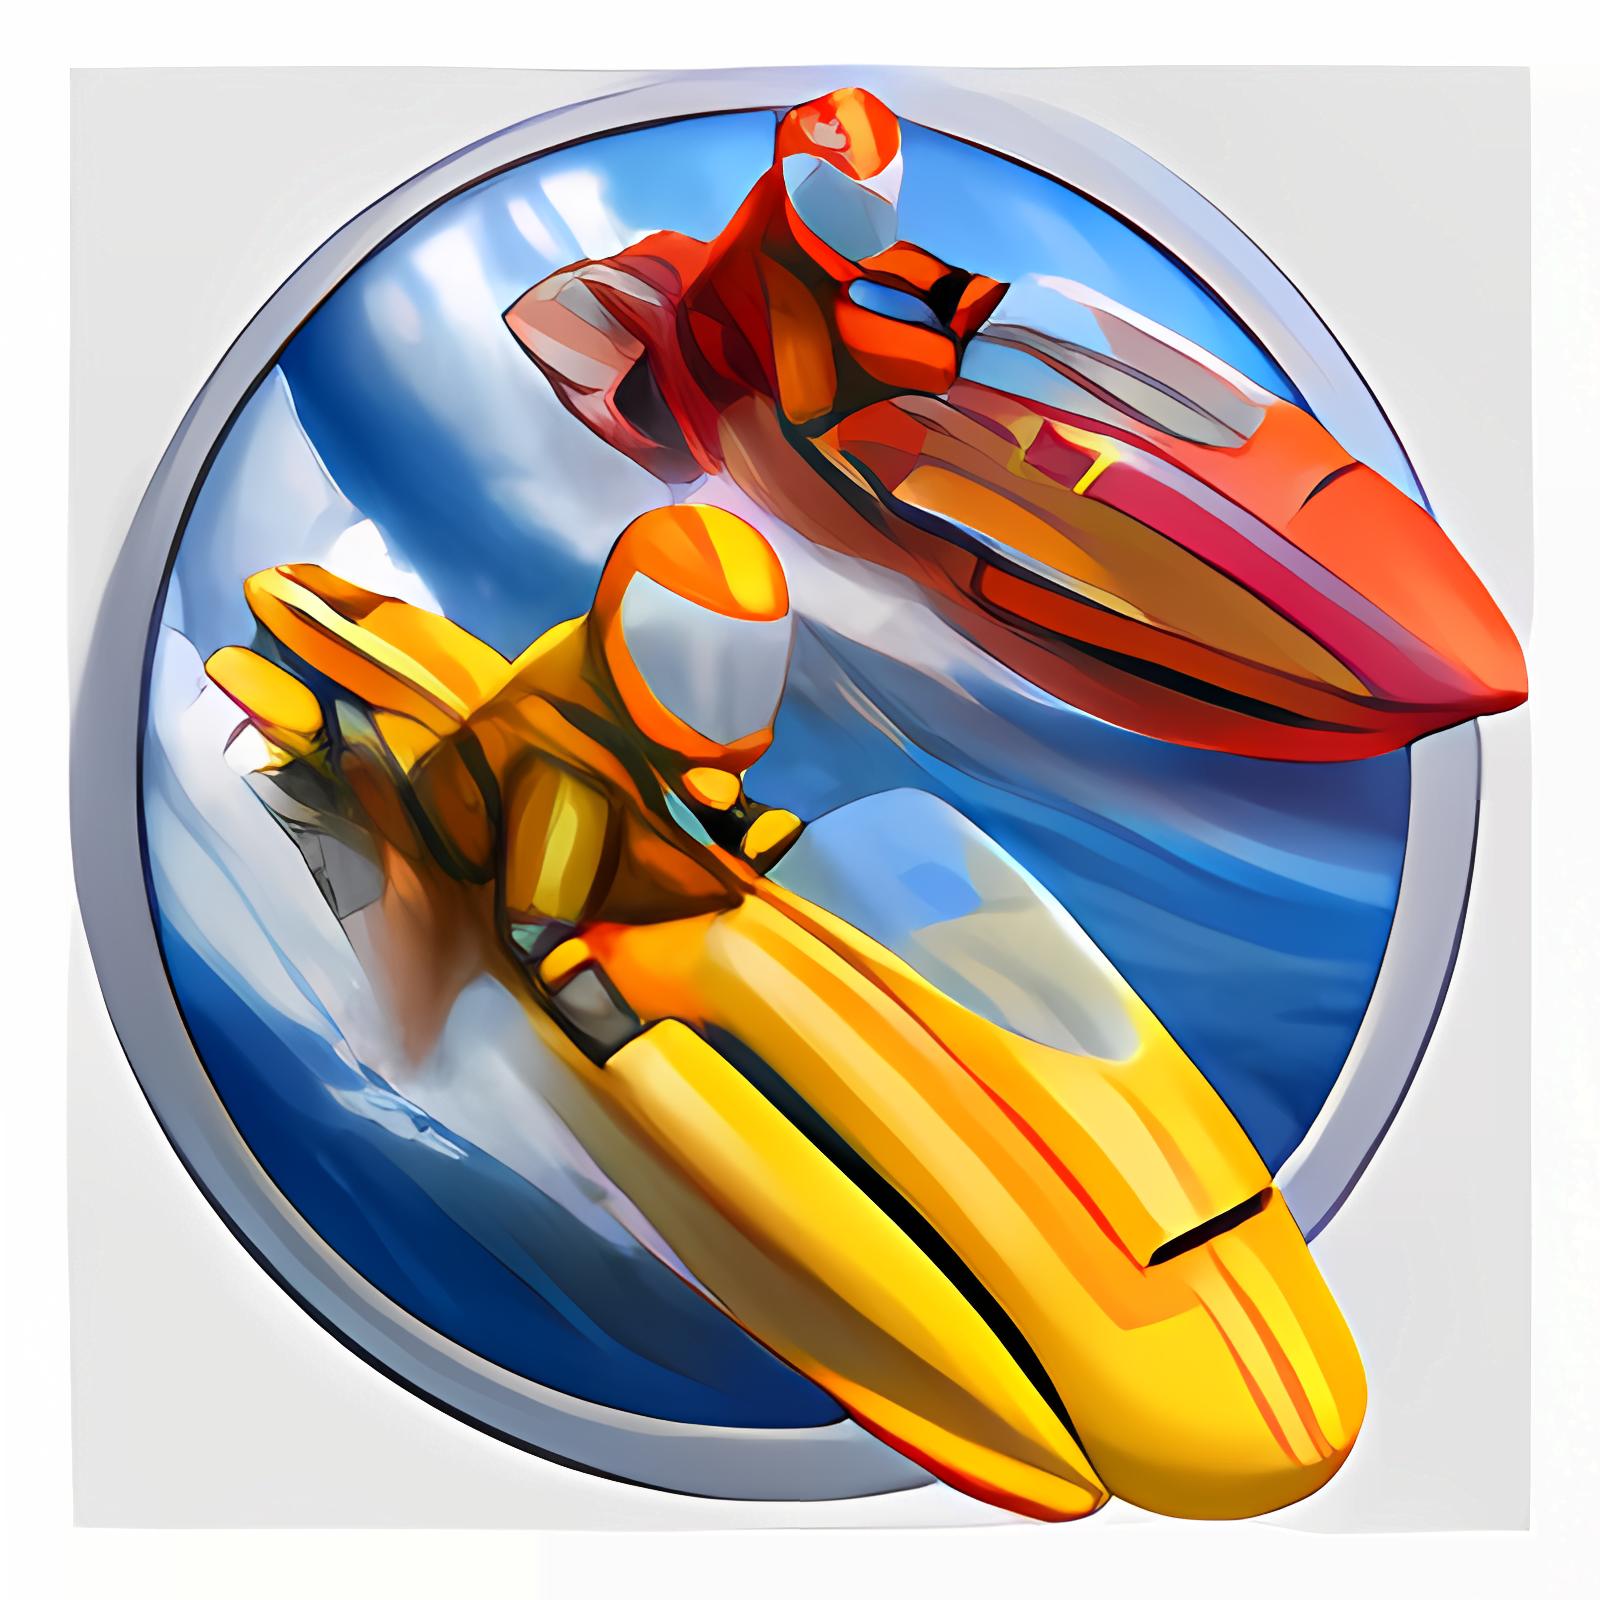 Riptide GP2 for Windows 10